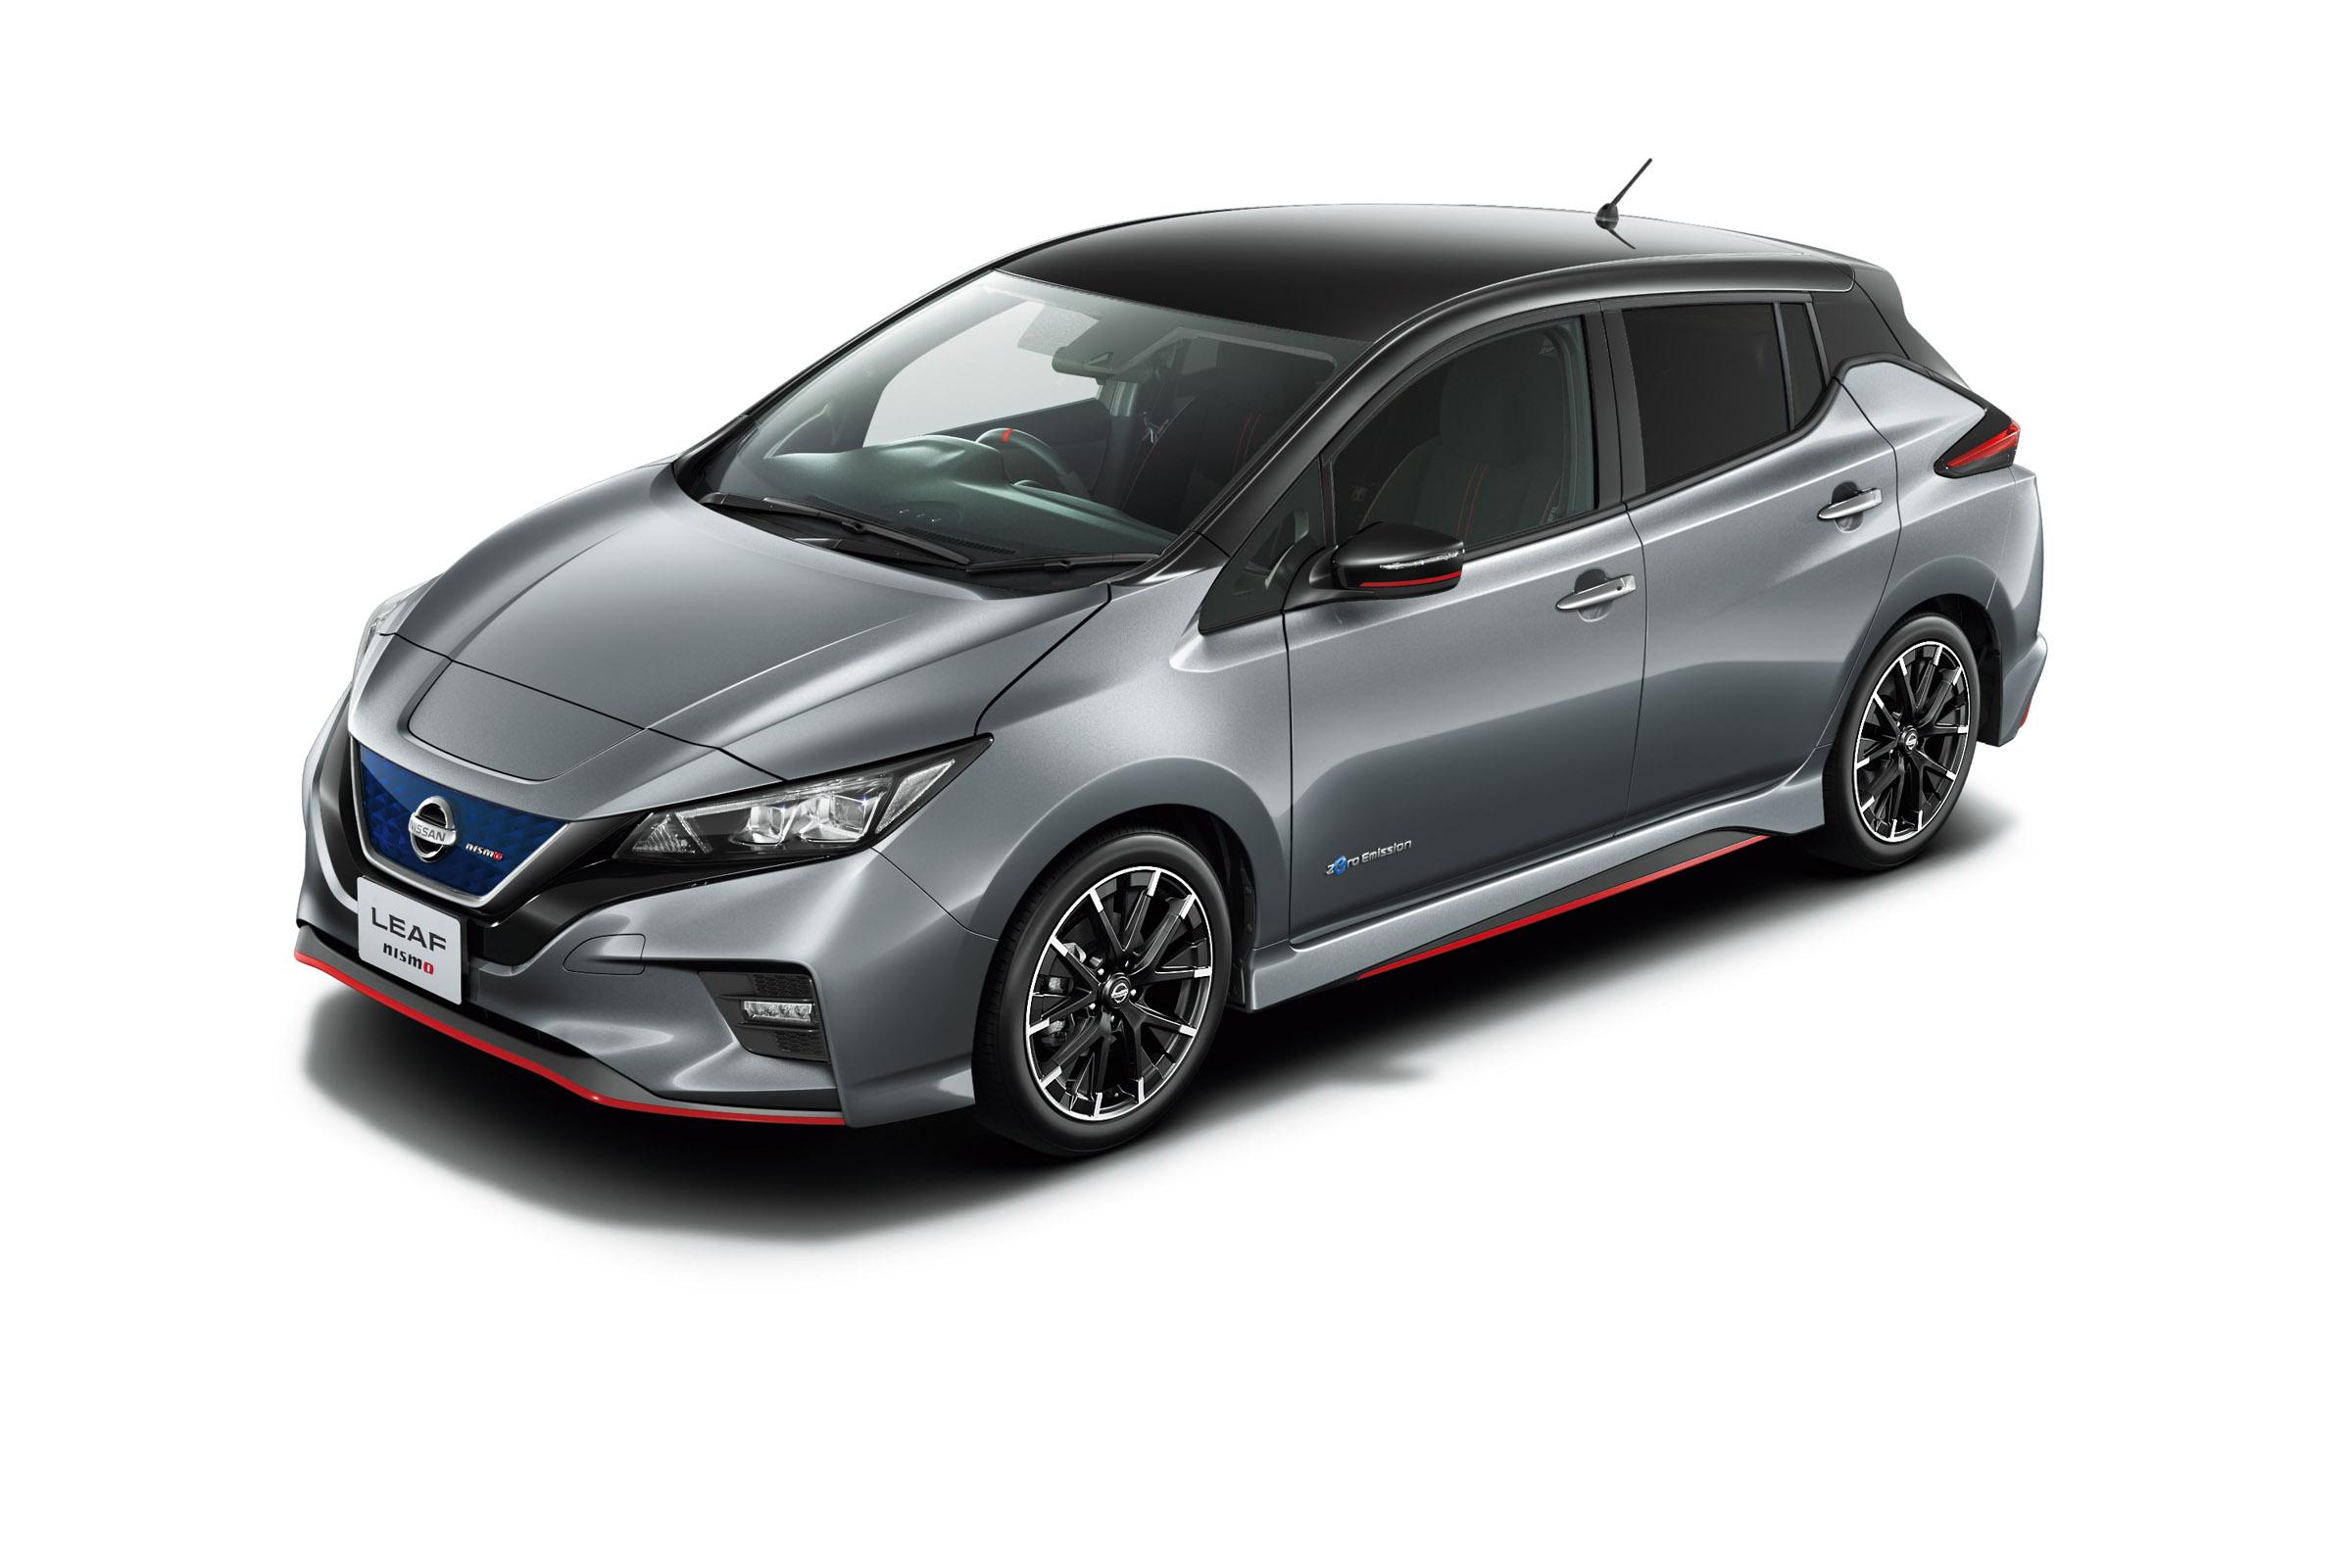 Nissan Leaf Nismo - Electric hot hatch debuts in Japan   Evo